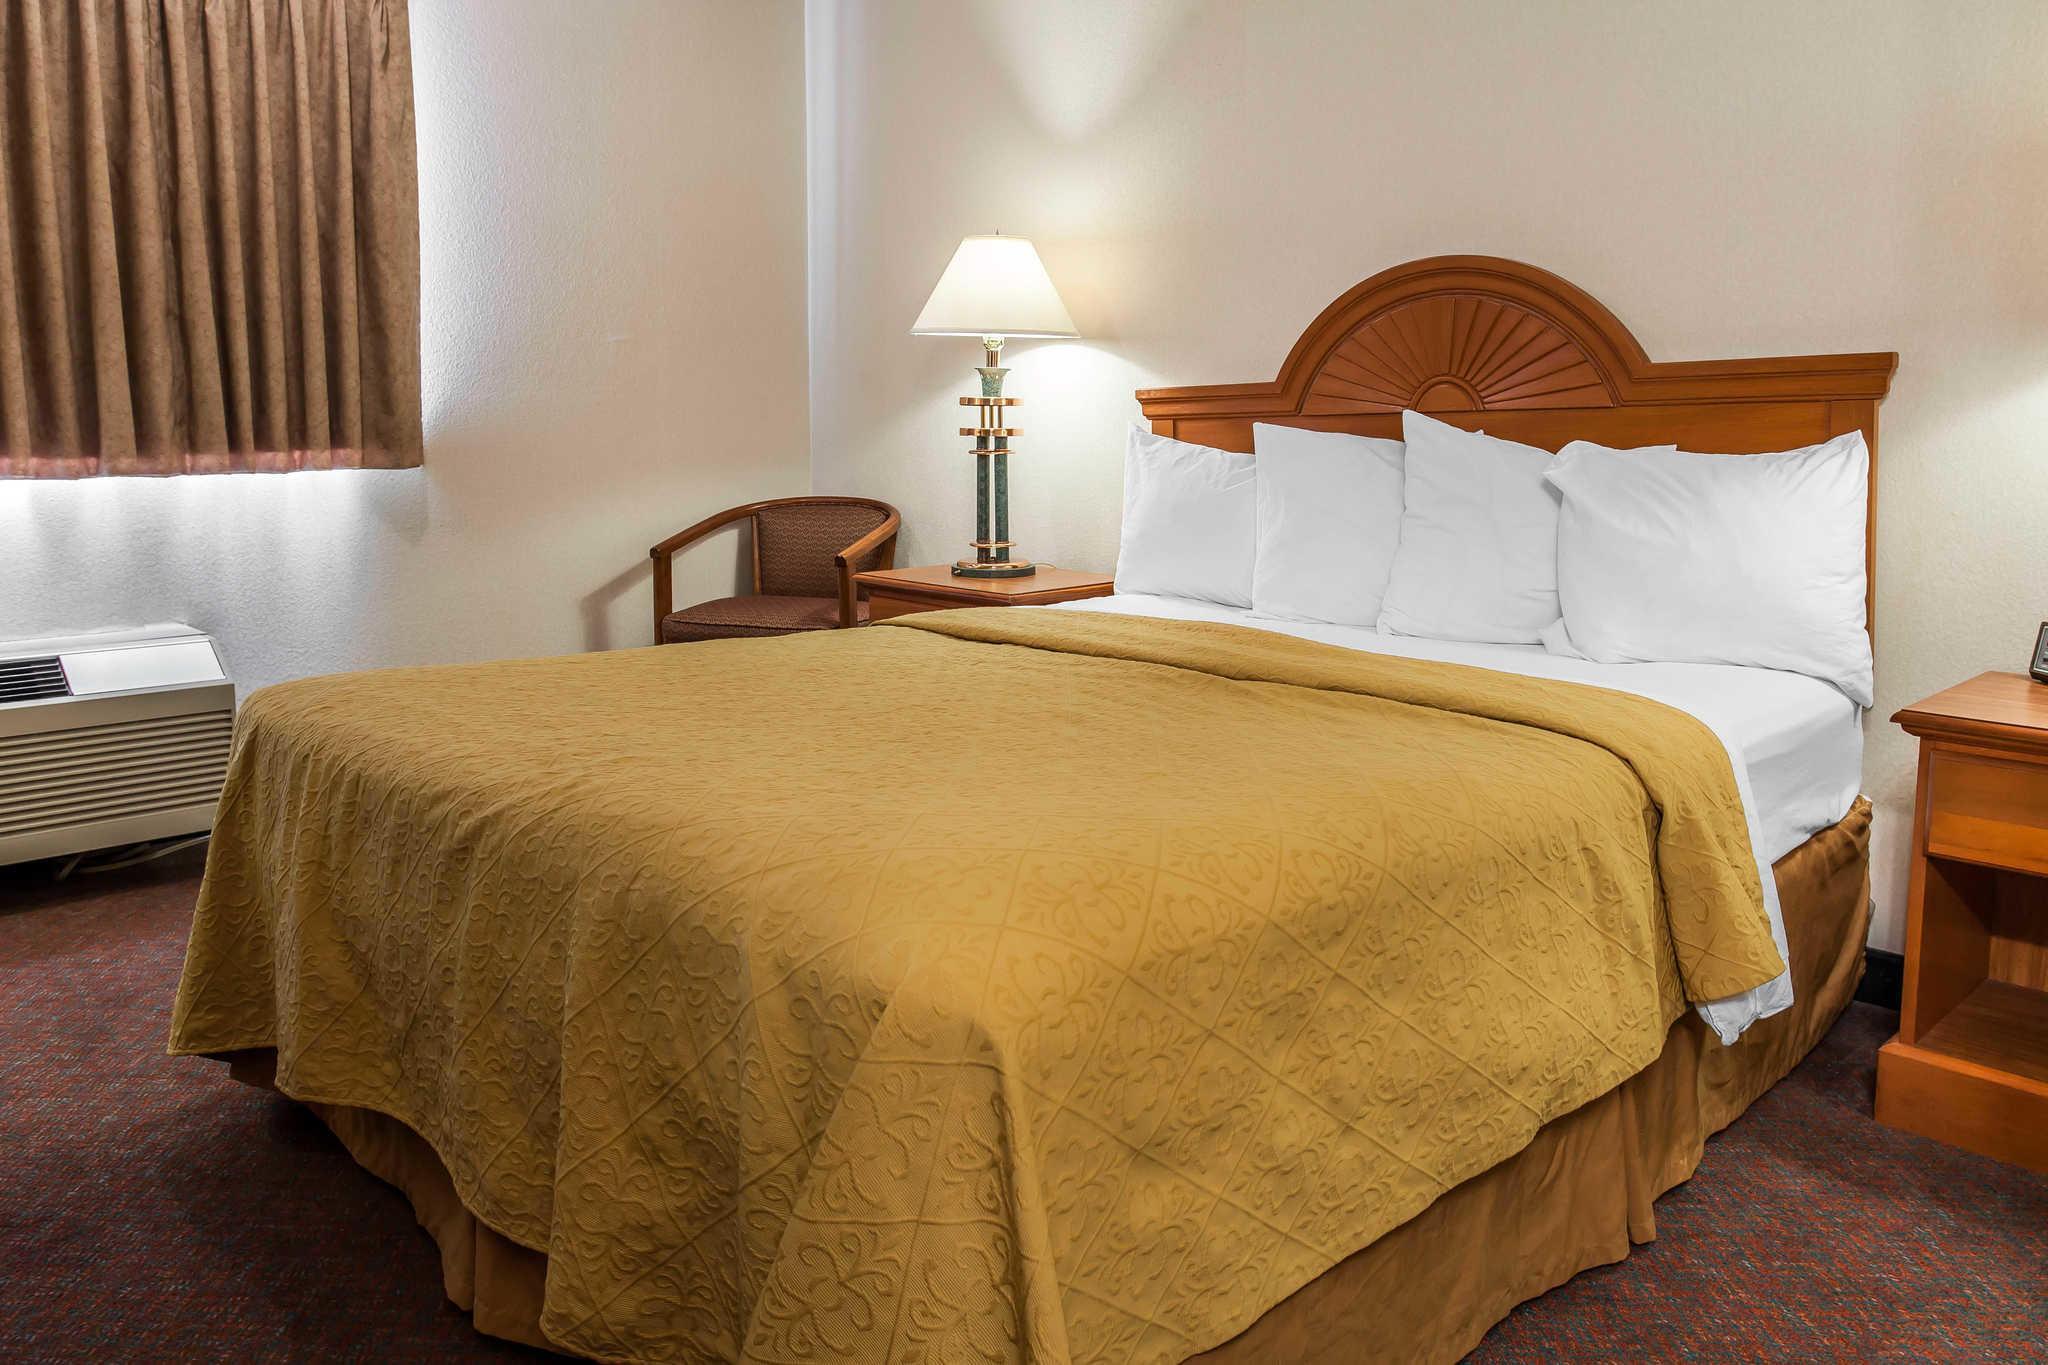 Hotels Near Lacey Wa